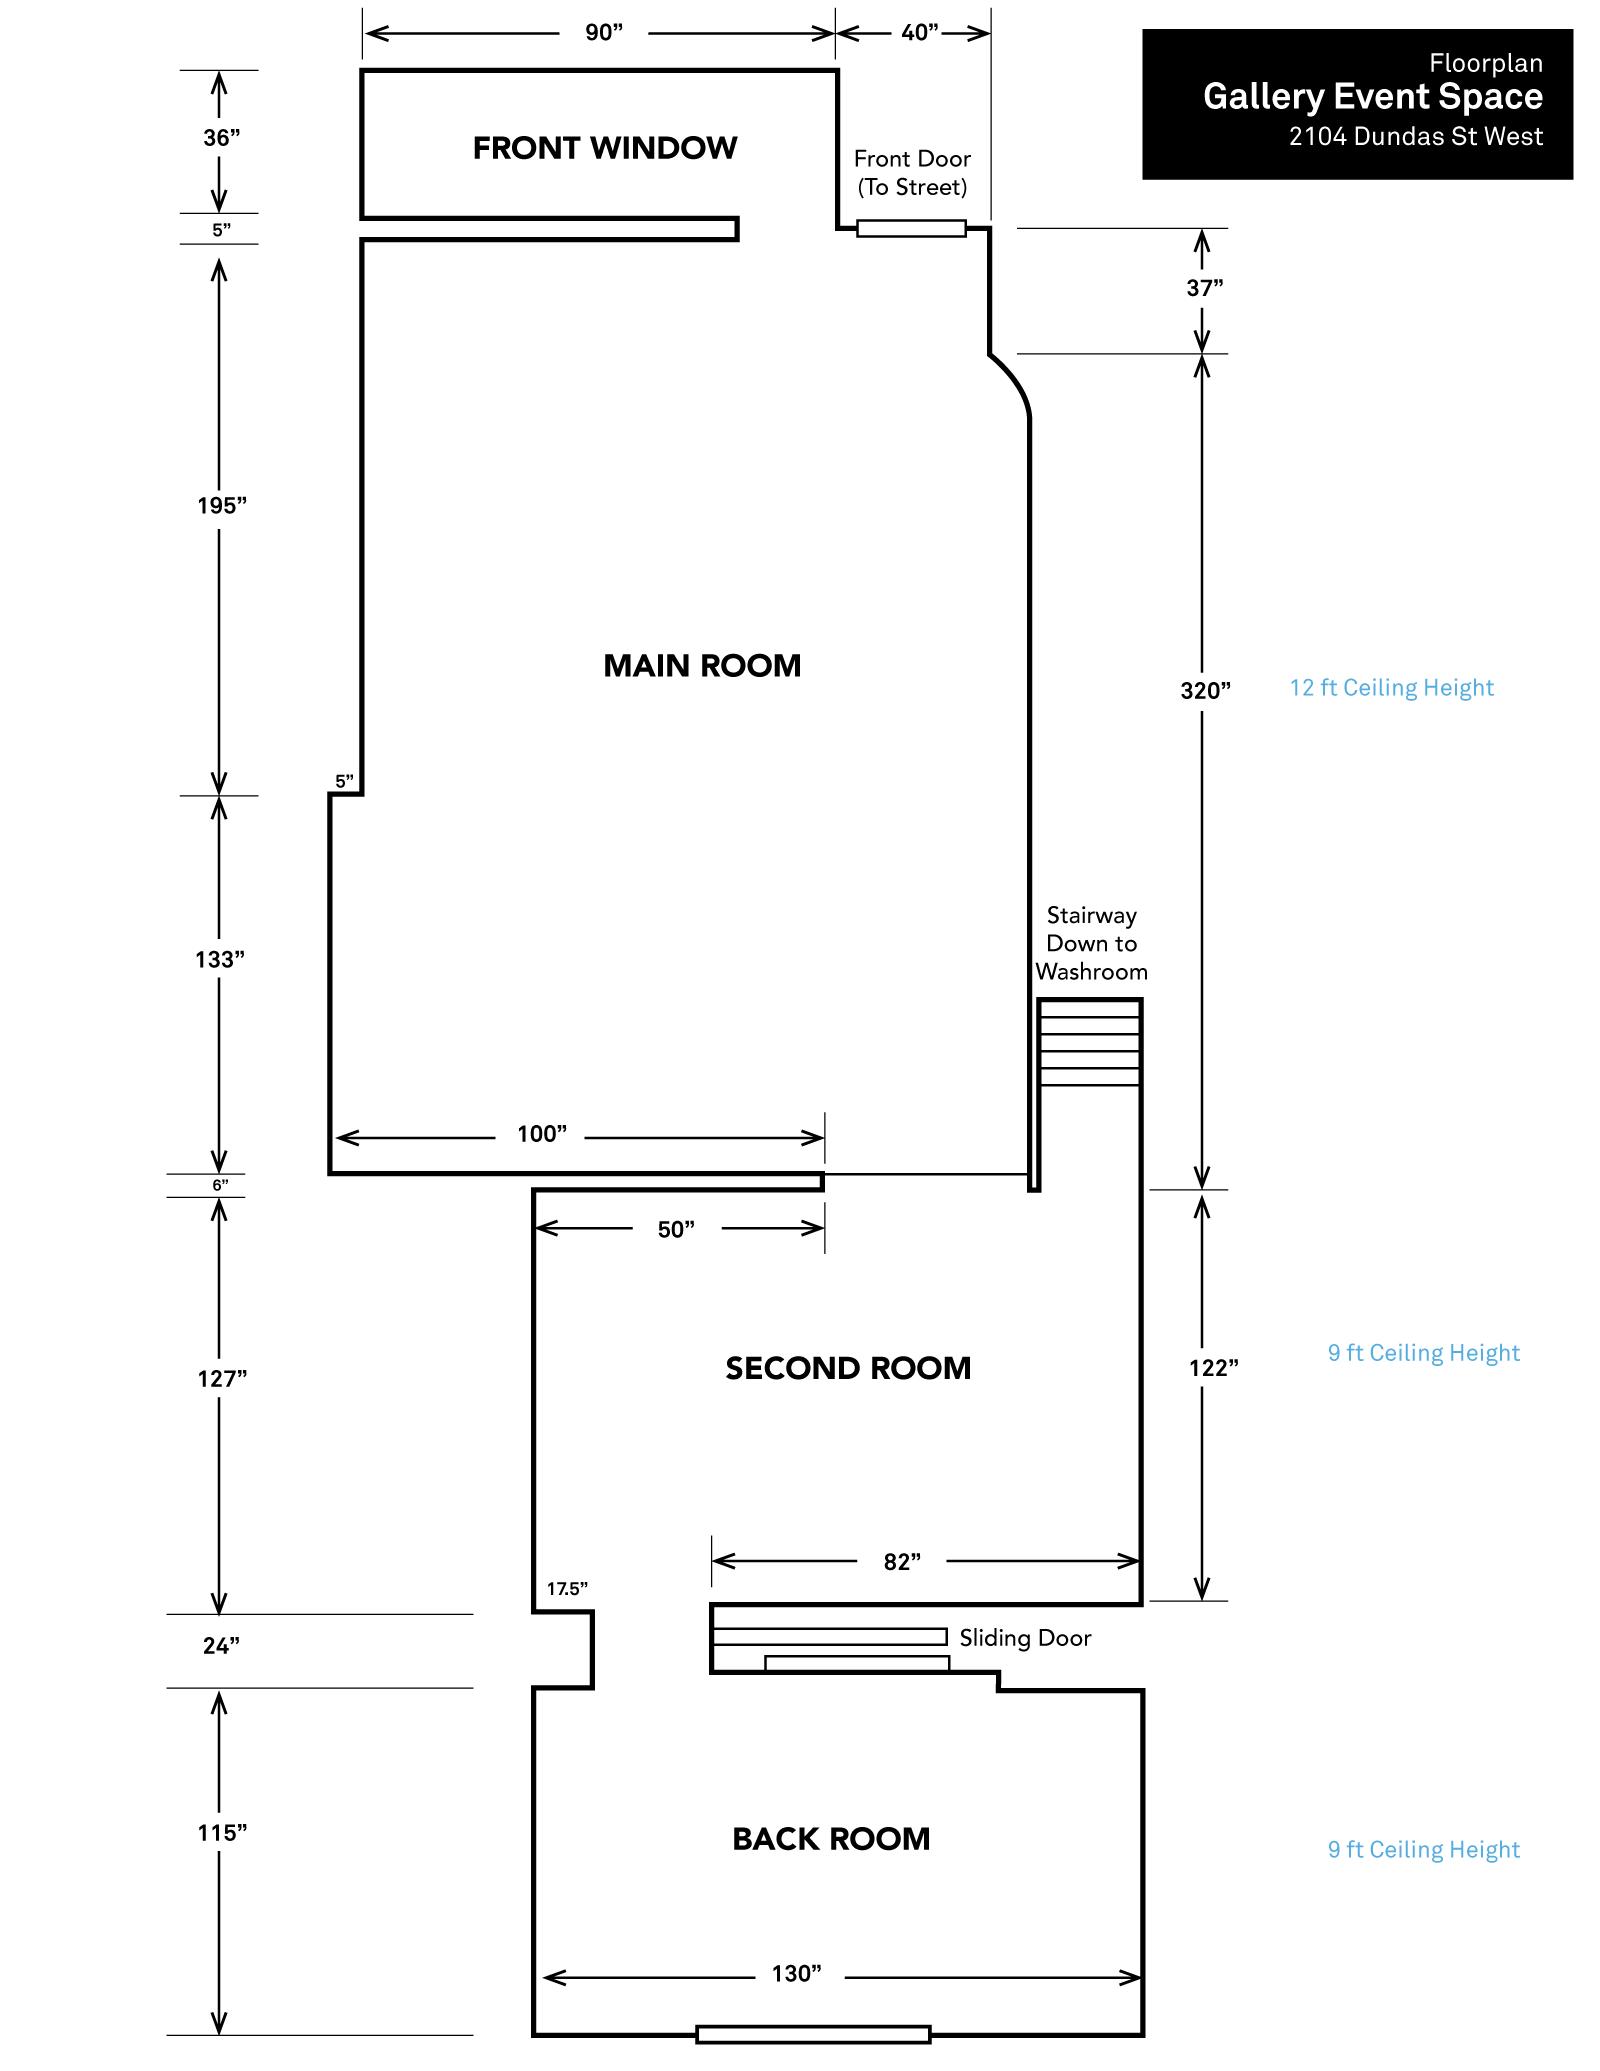 narwhal_2104dundas_gallery_floorplan